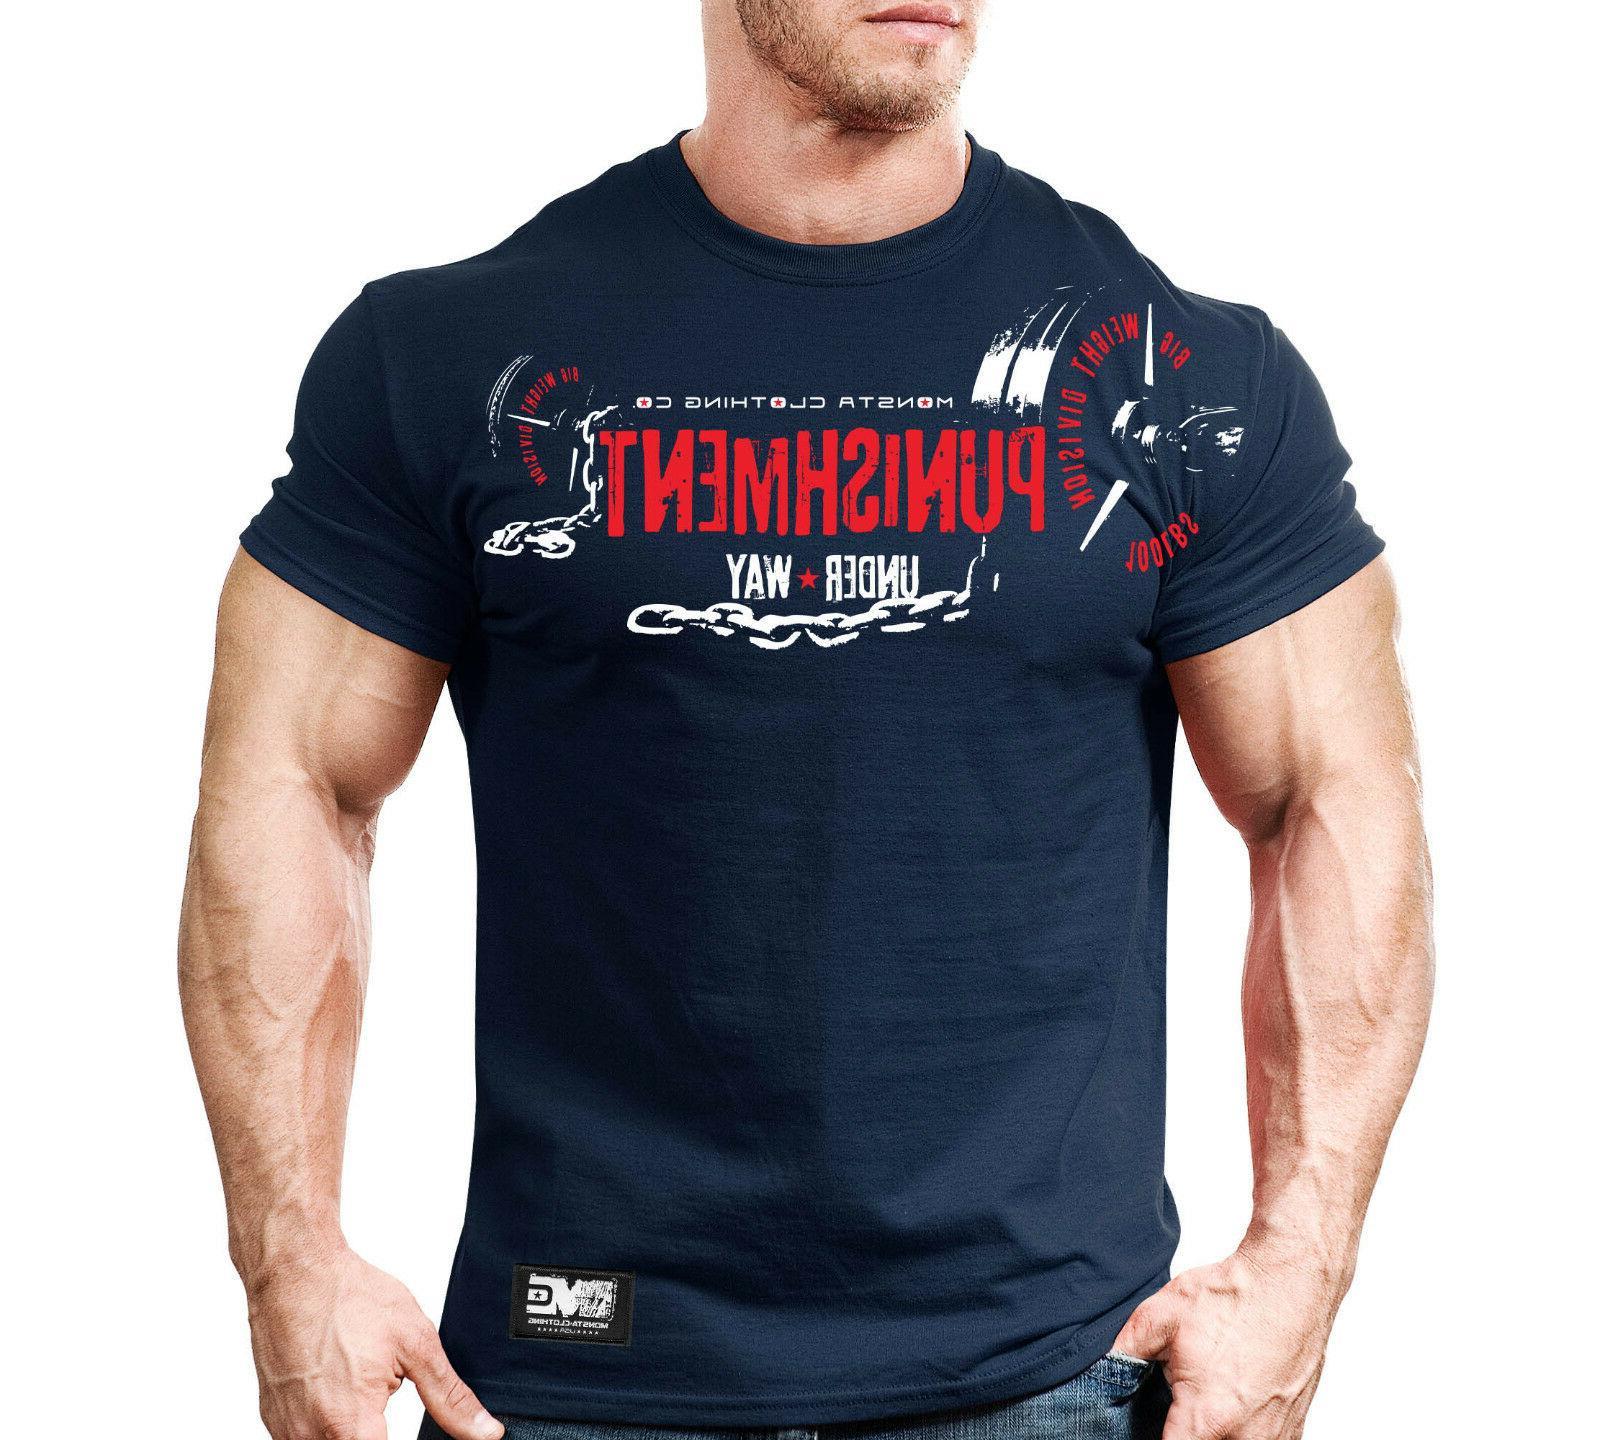 New Monsta Fitness Gym Workout T-shirt - Punishment